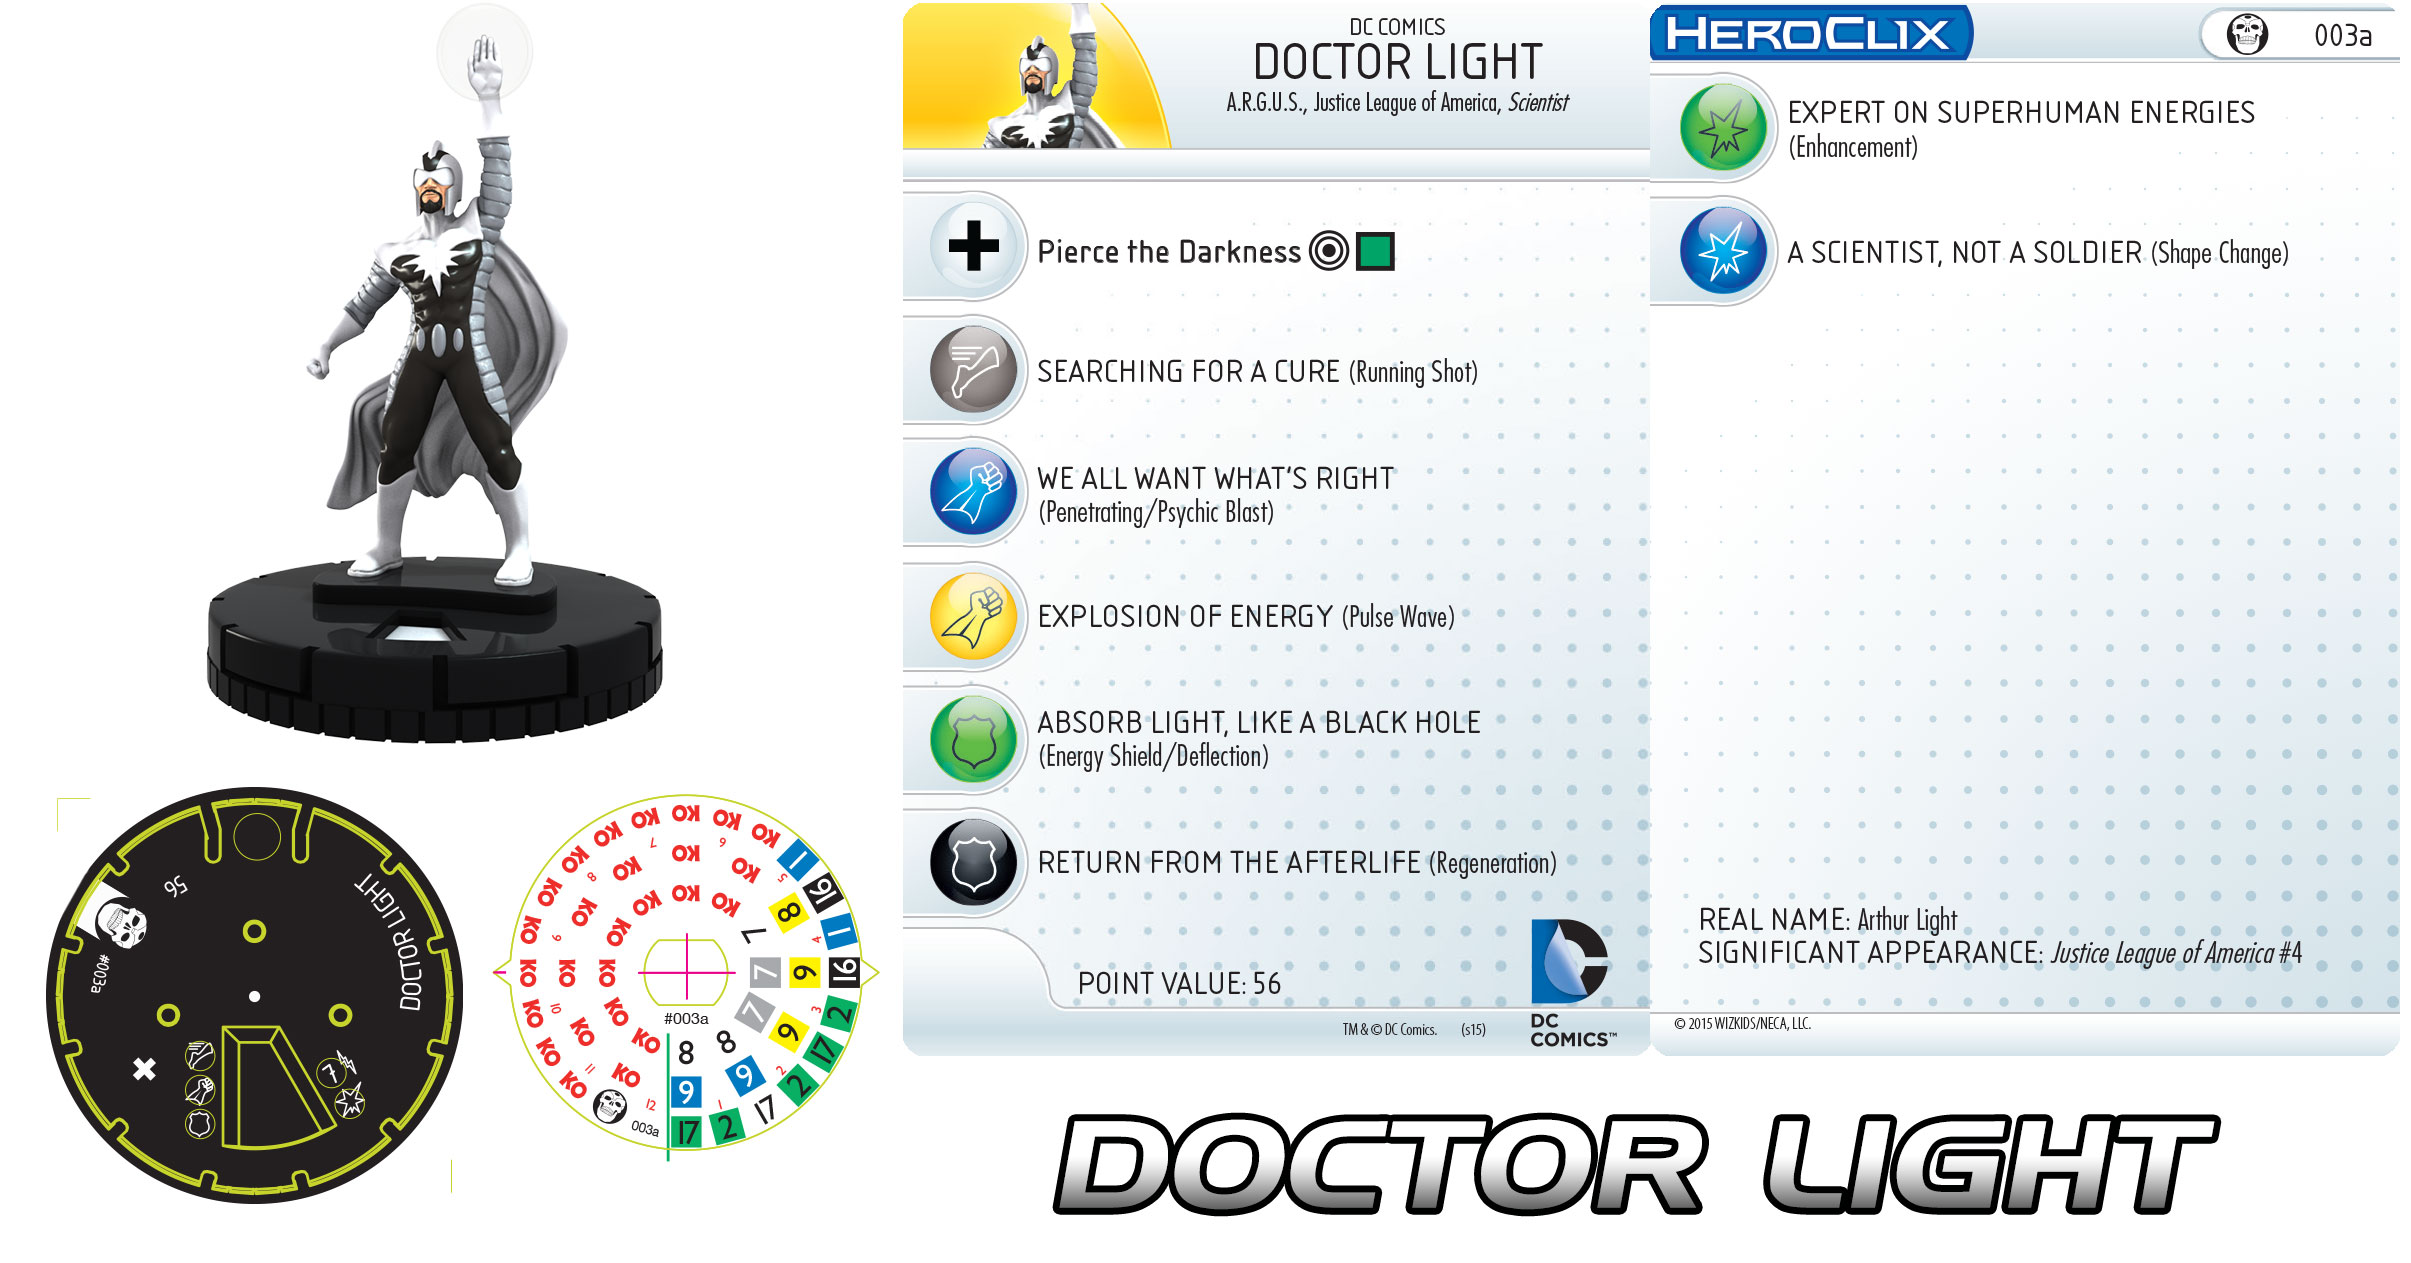 heroclix-doctor-light.jpg